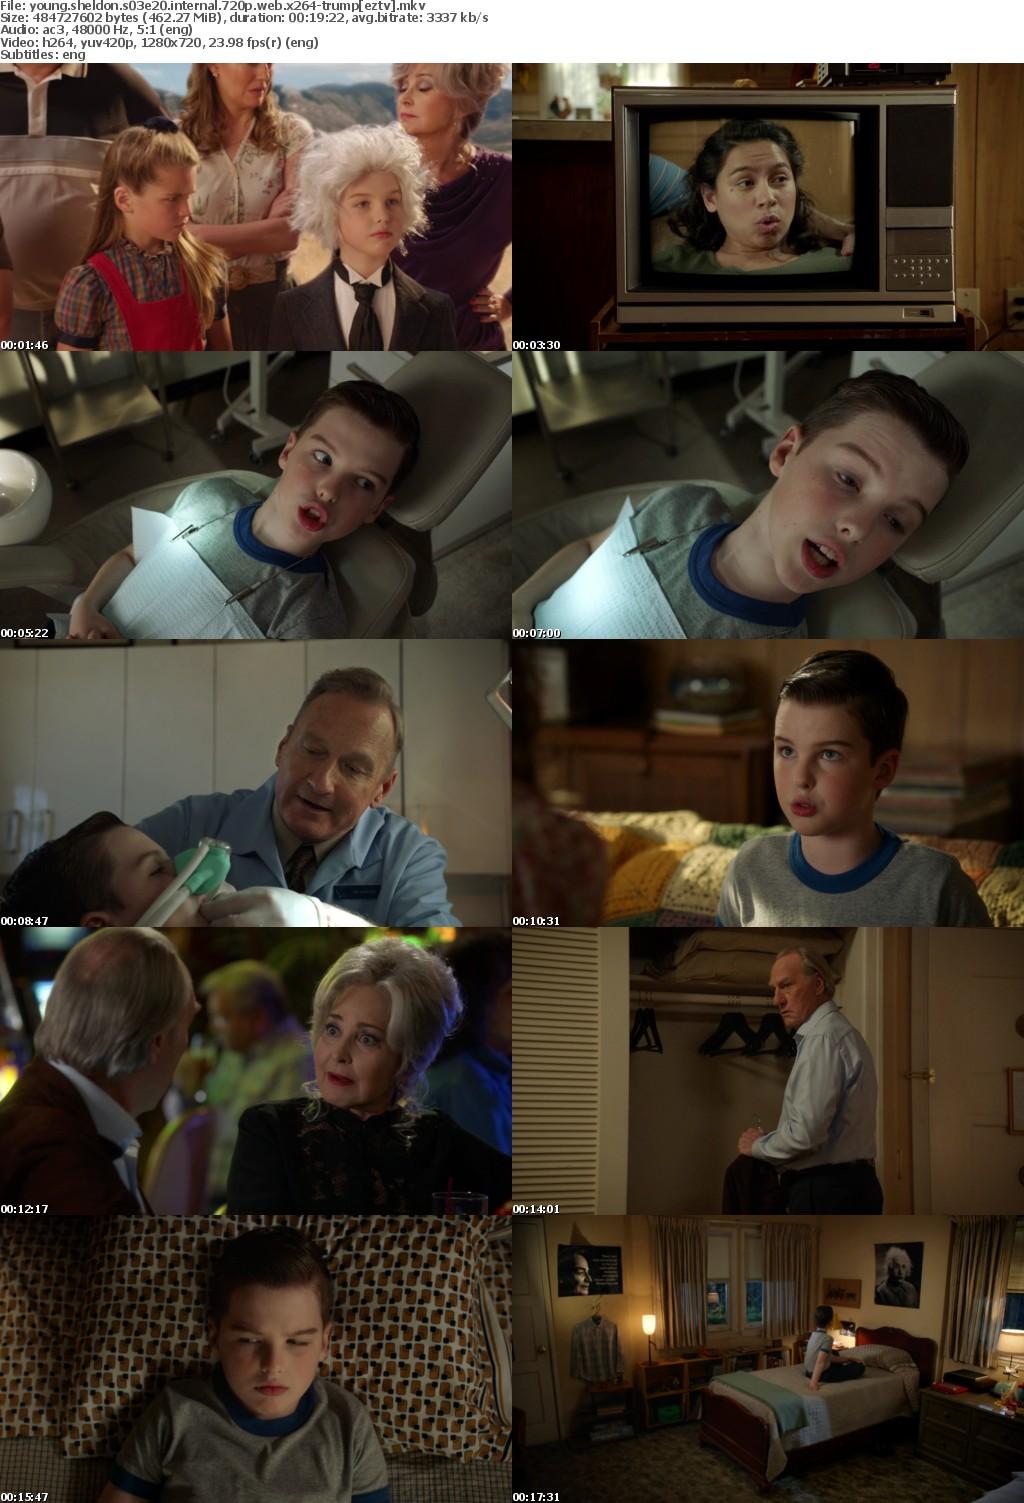 Young Sheldon S03E20 iNTERNAL 720p WEB x264-TRUMP